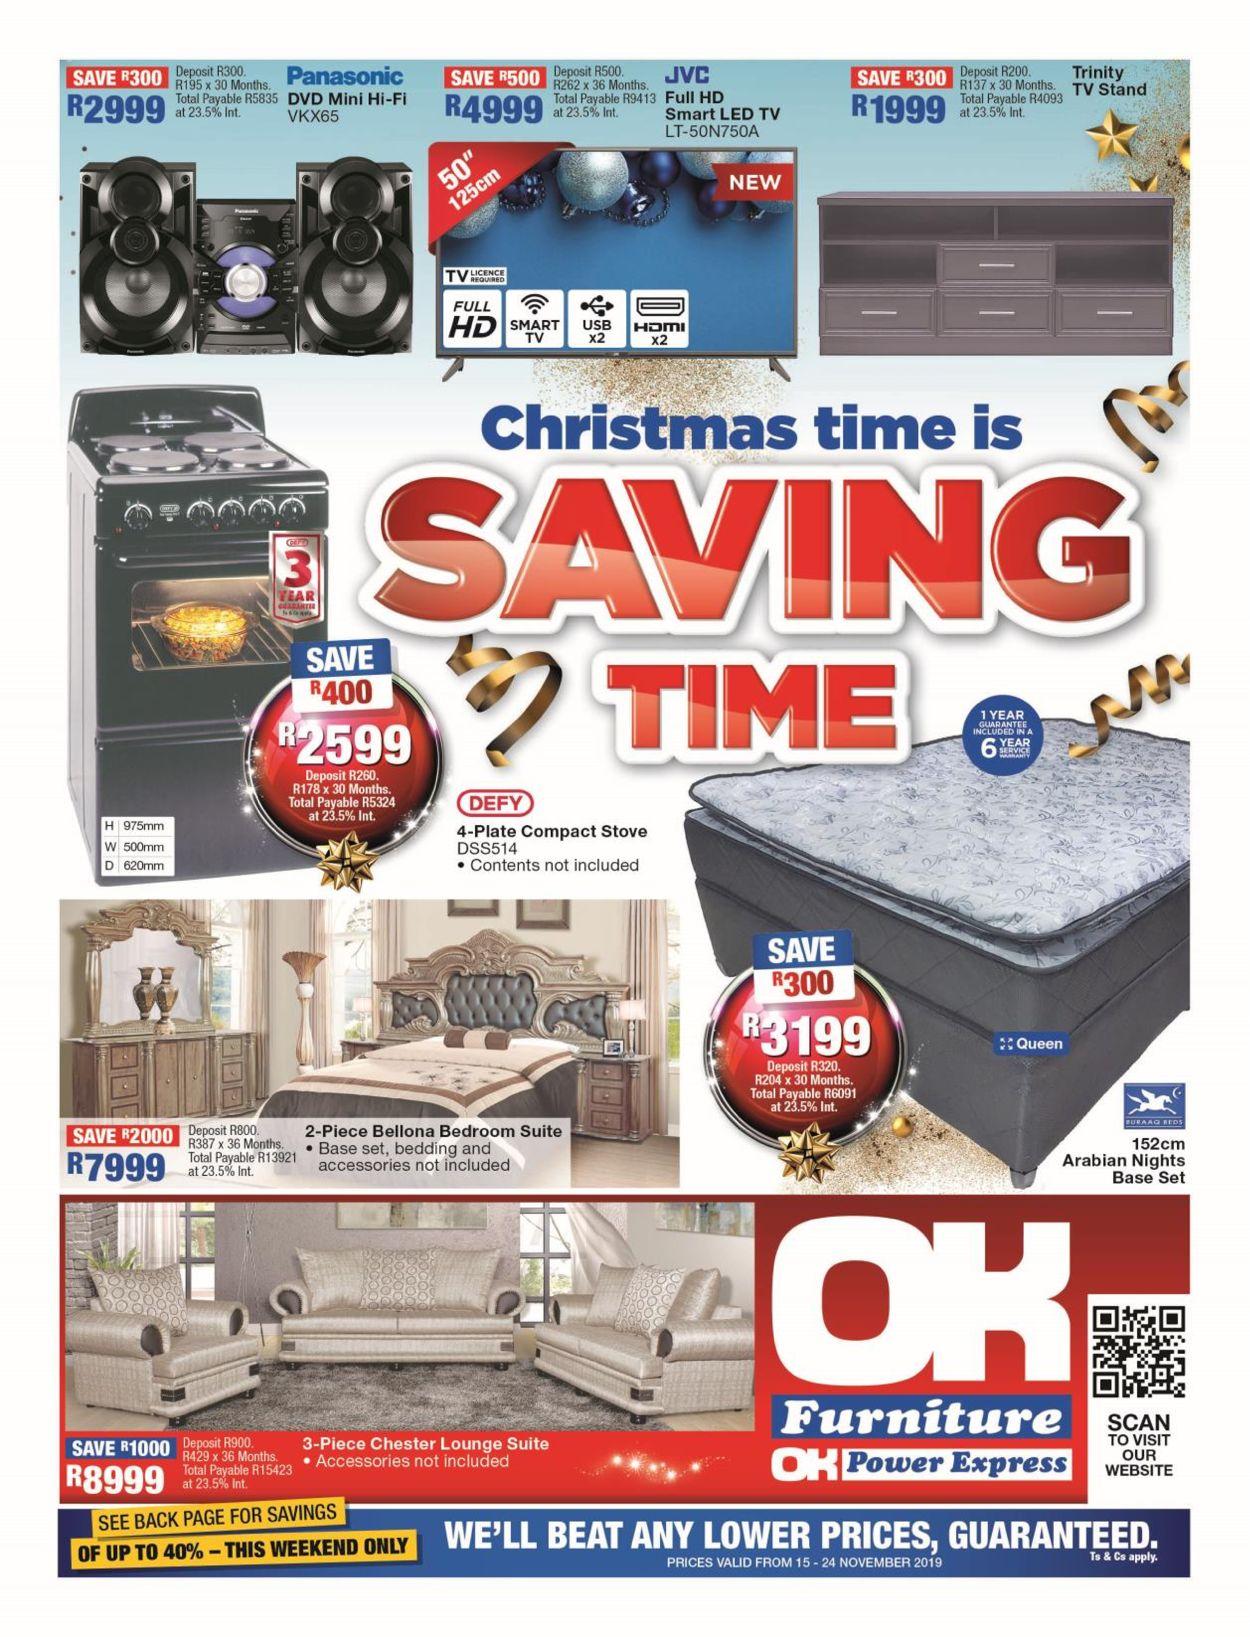 OK Furniture Christmas Catalogue 2019 Catalogue - 2019/11/15-2019/11/24